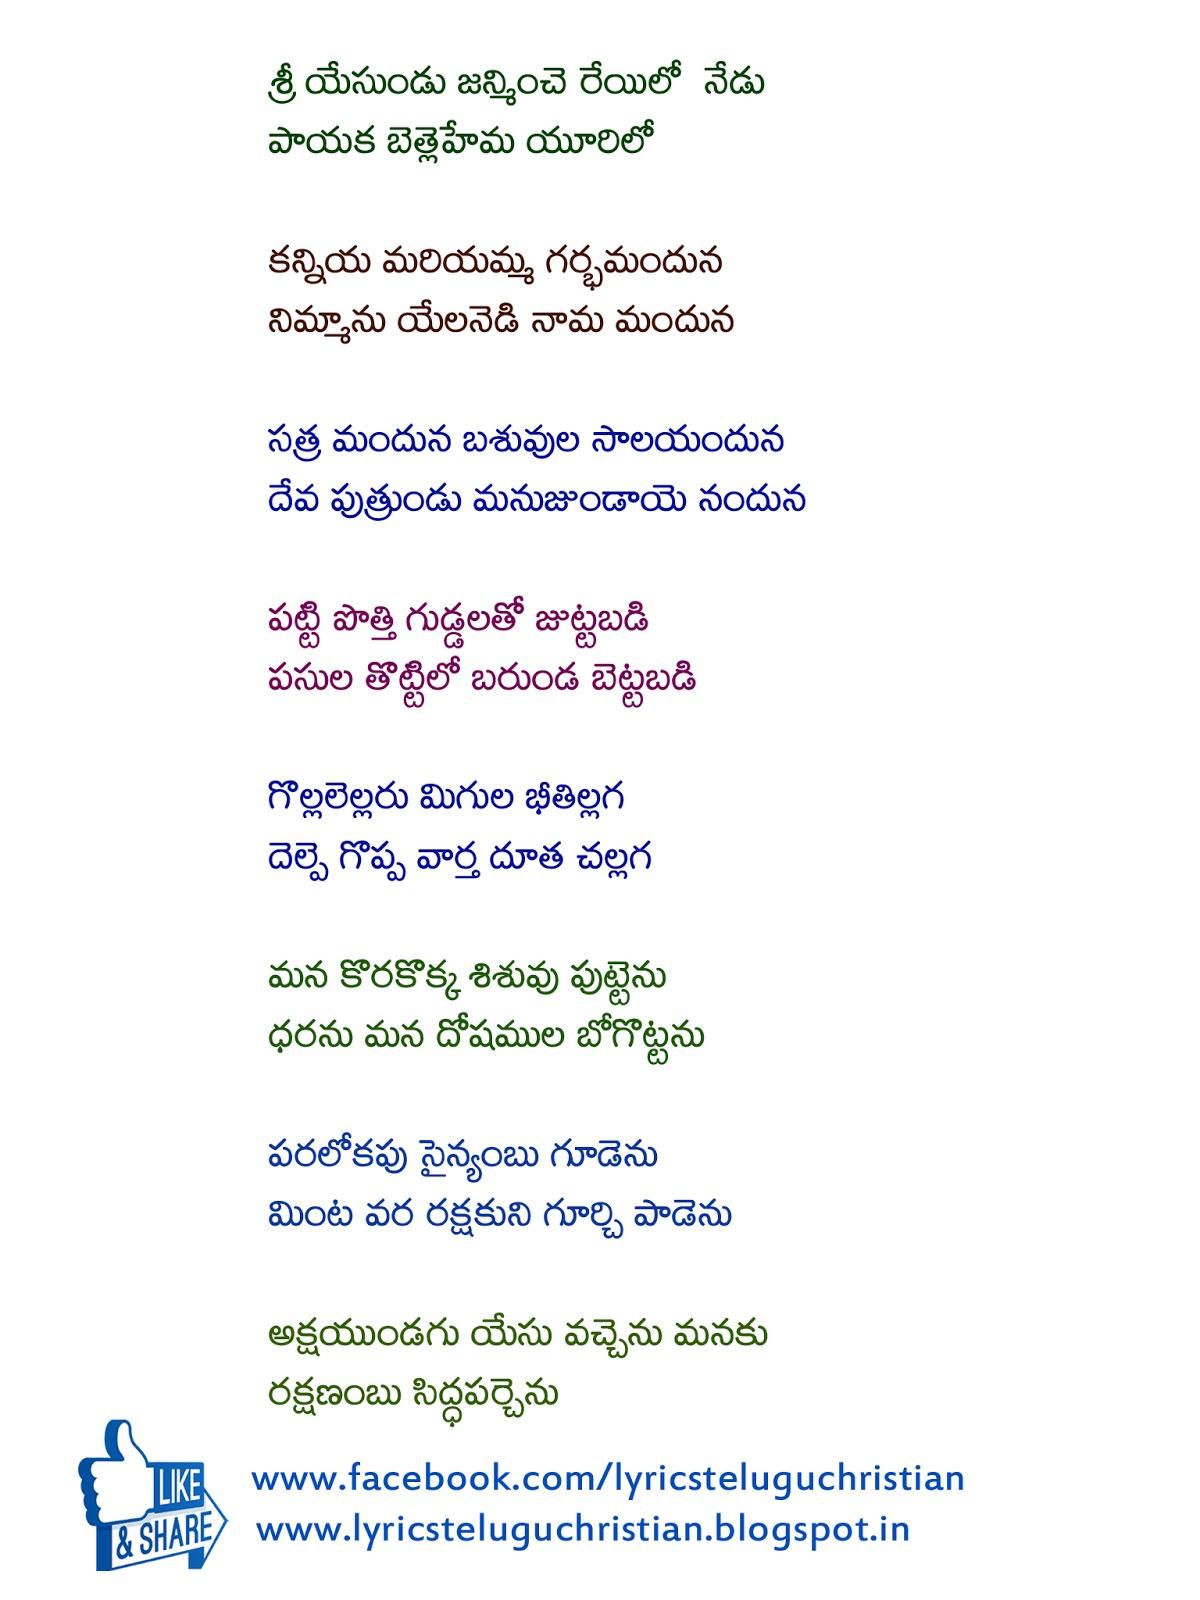 Telugu Christmas Songs (Lyrics) | Telugu Christian Lyrics